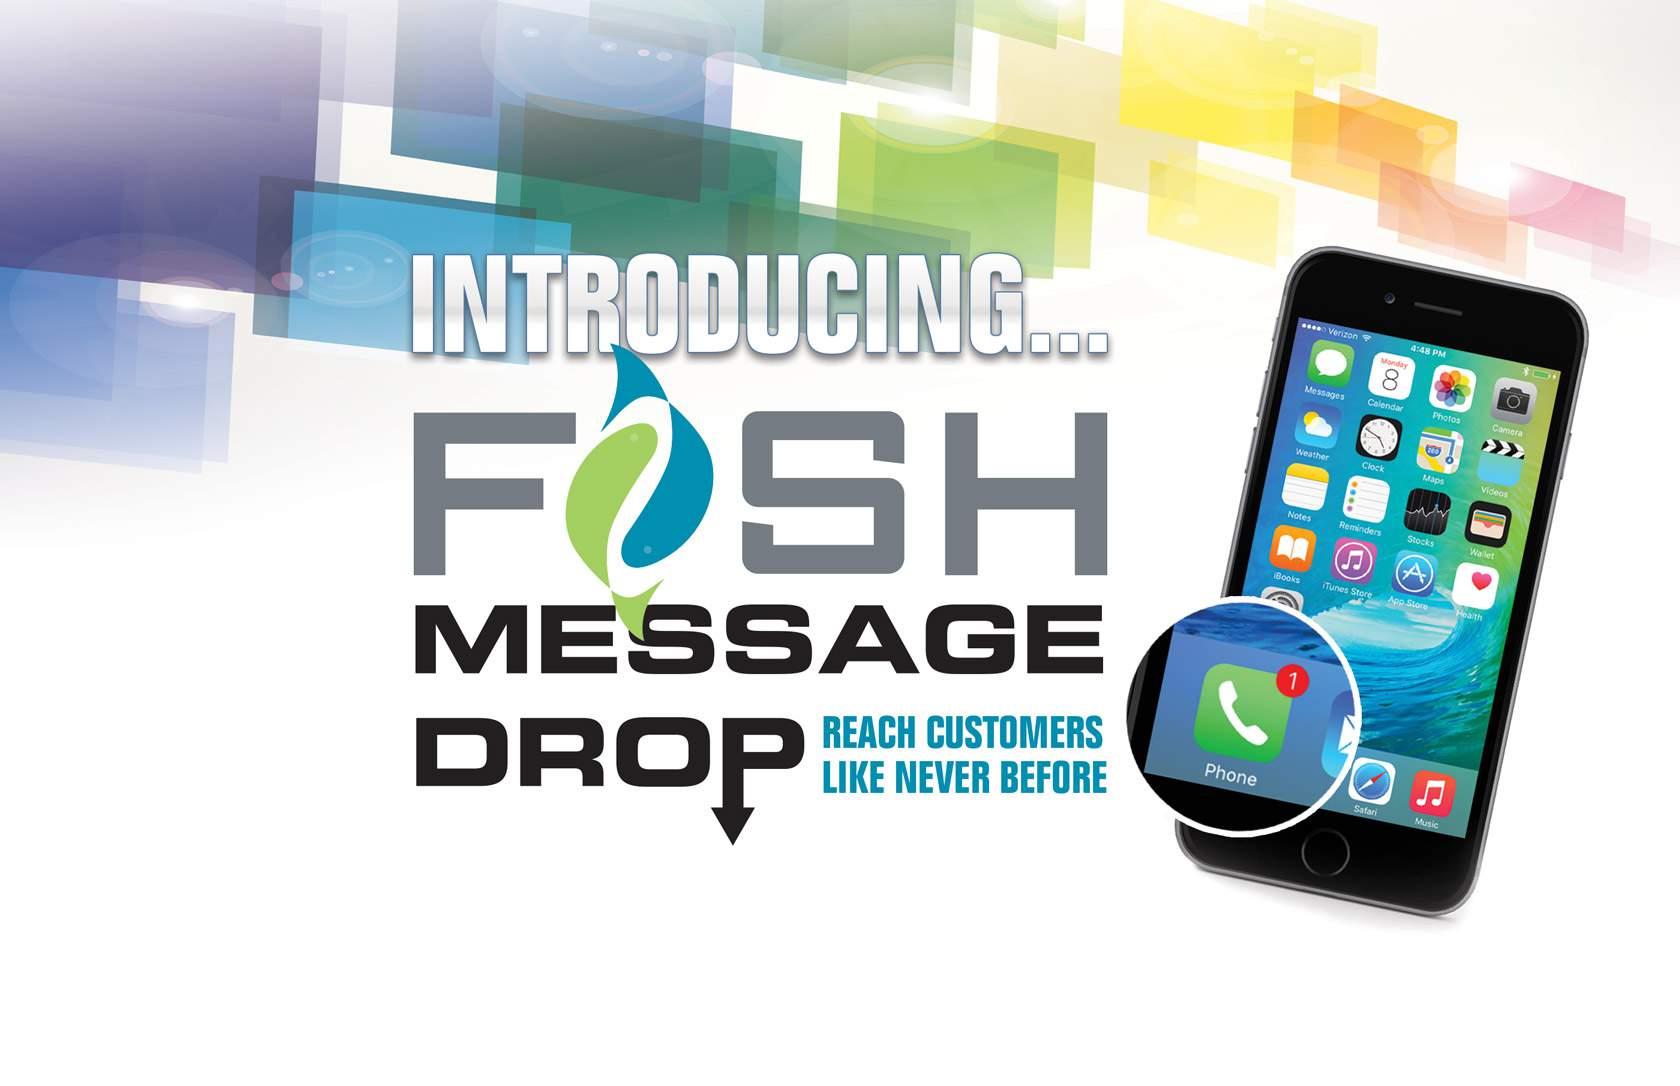 Fish-Advertising-Rhode-Island-Marketing-Advertising-Agencies-Agency-x20__1504109157_68.15.51.168